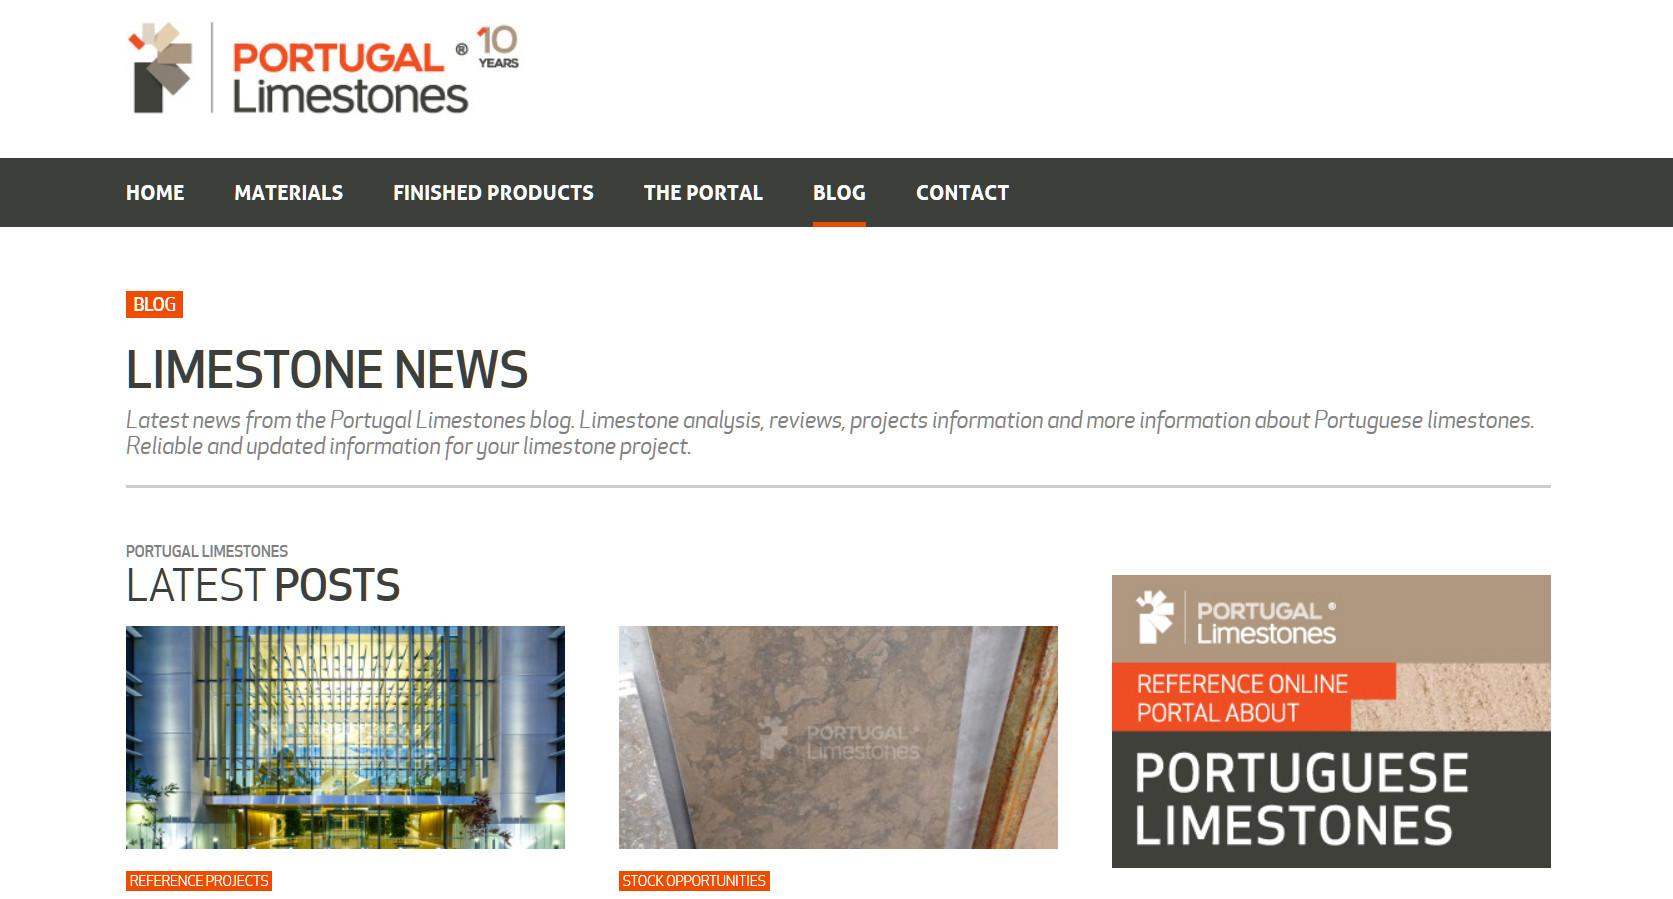 Portugalimestones.com - Blog